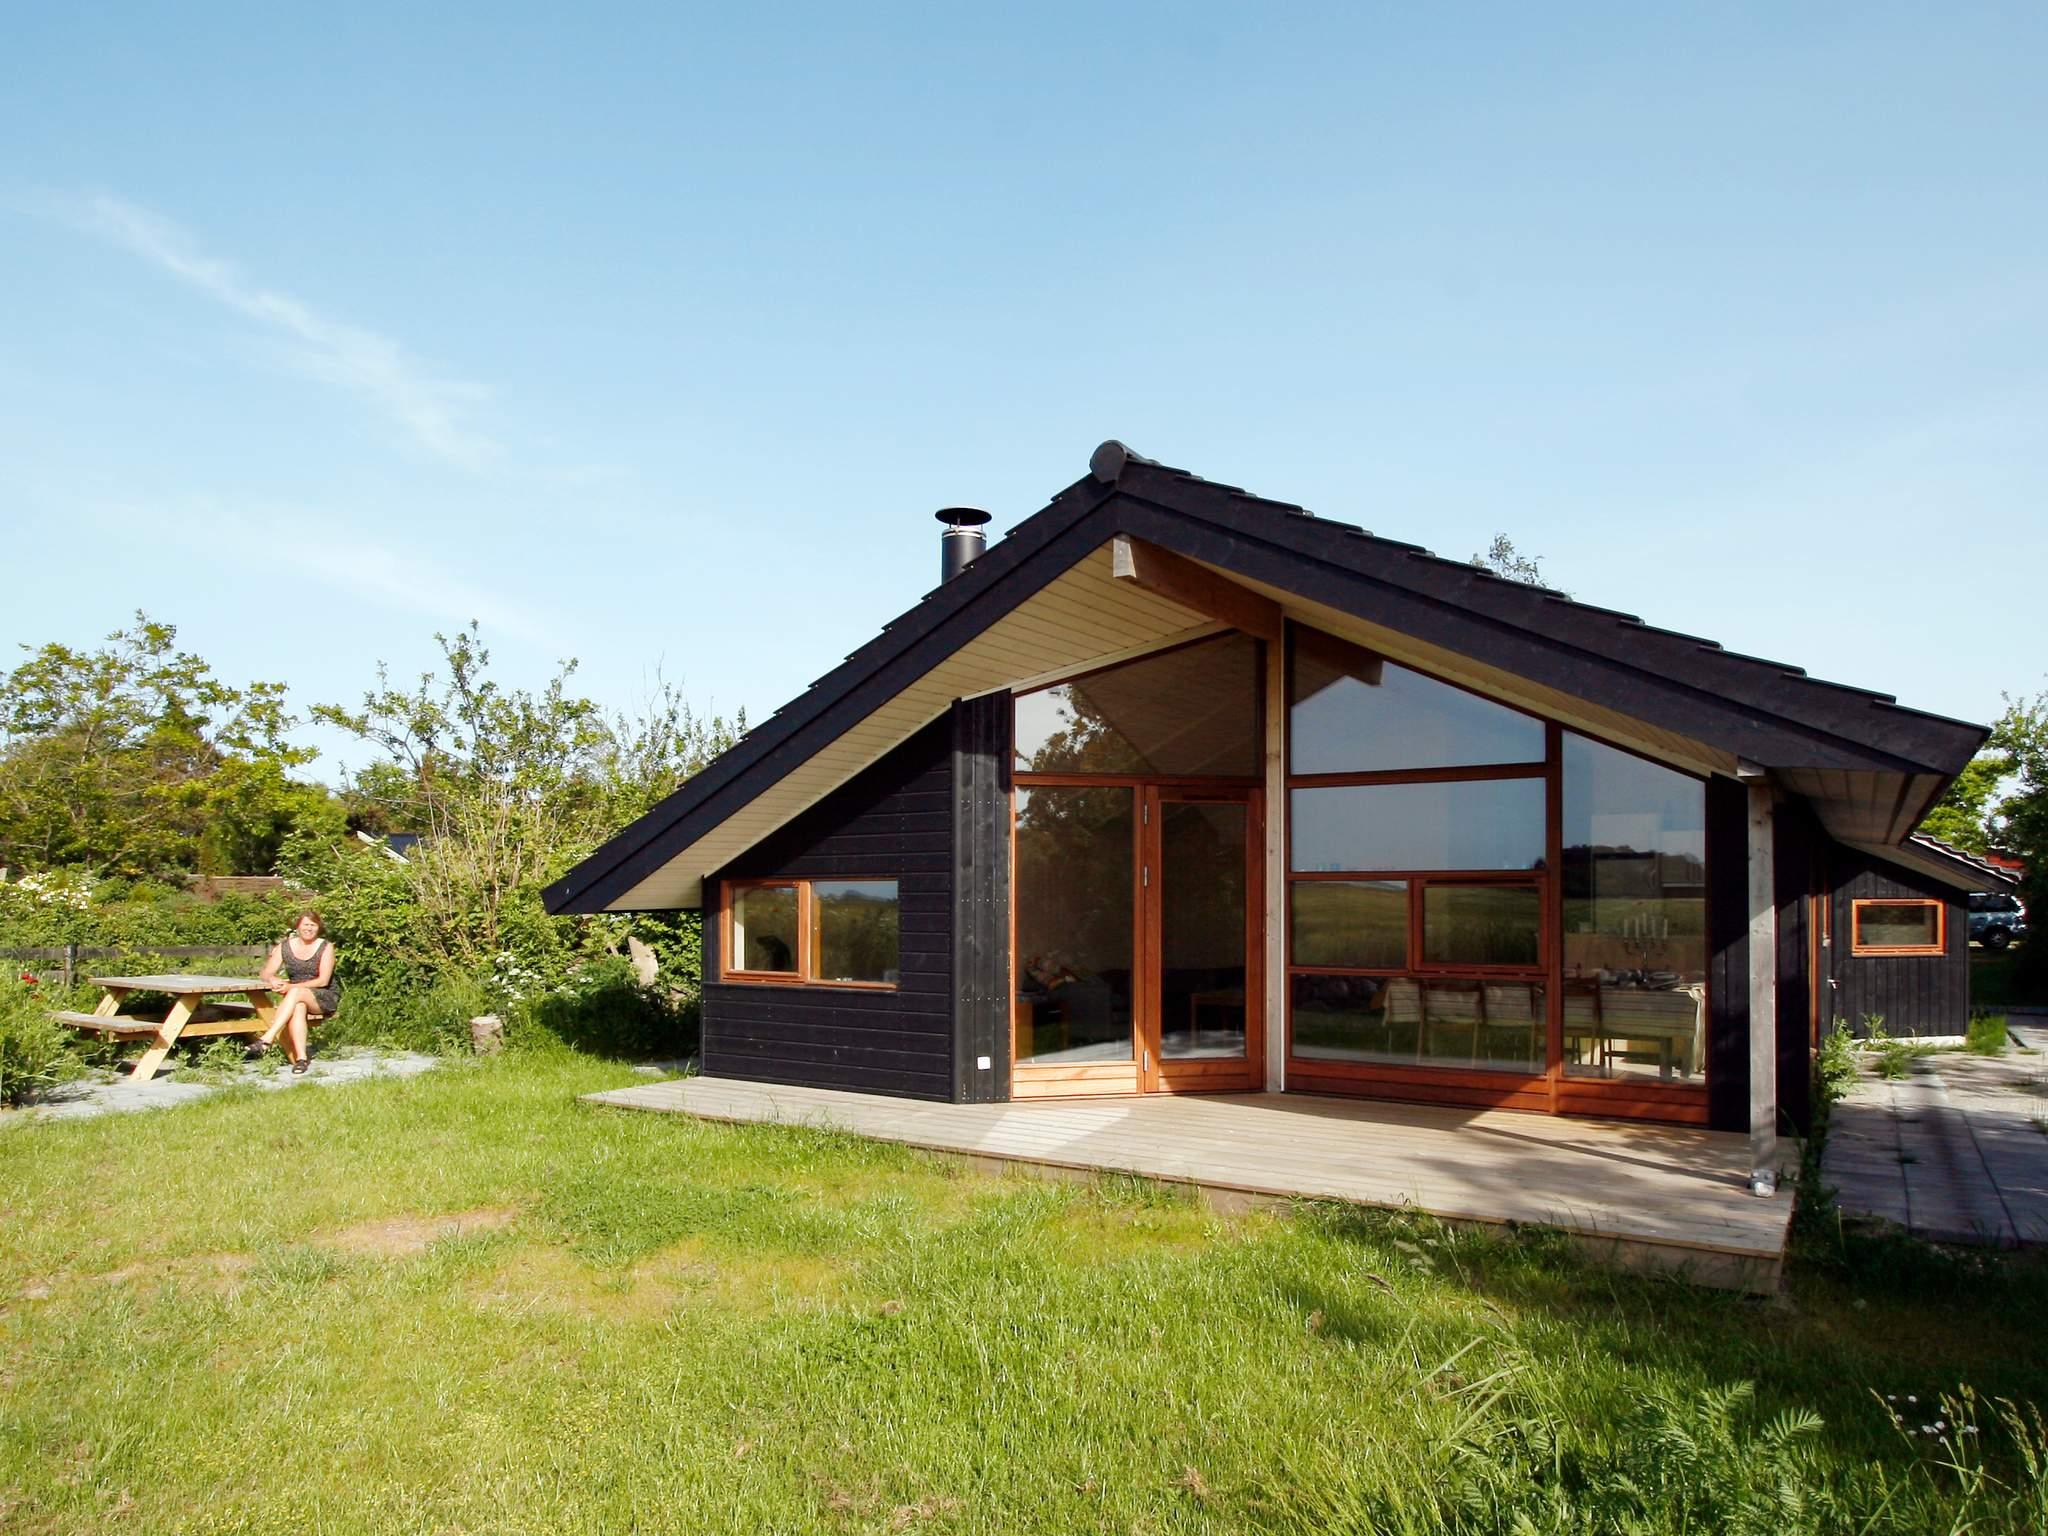 Ferienhaus Ore Strand (300650), Oreby, , Südseeland, Dänemark, Bild 14